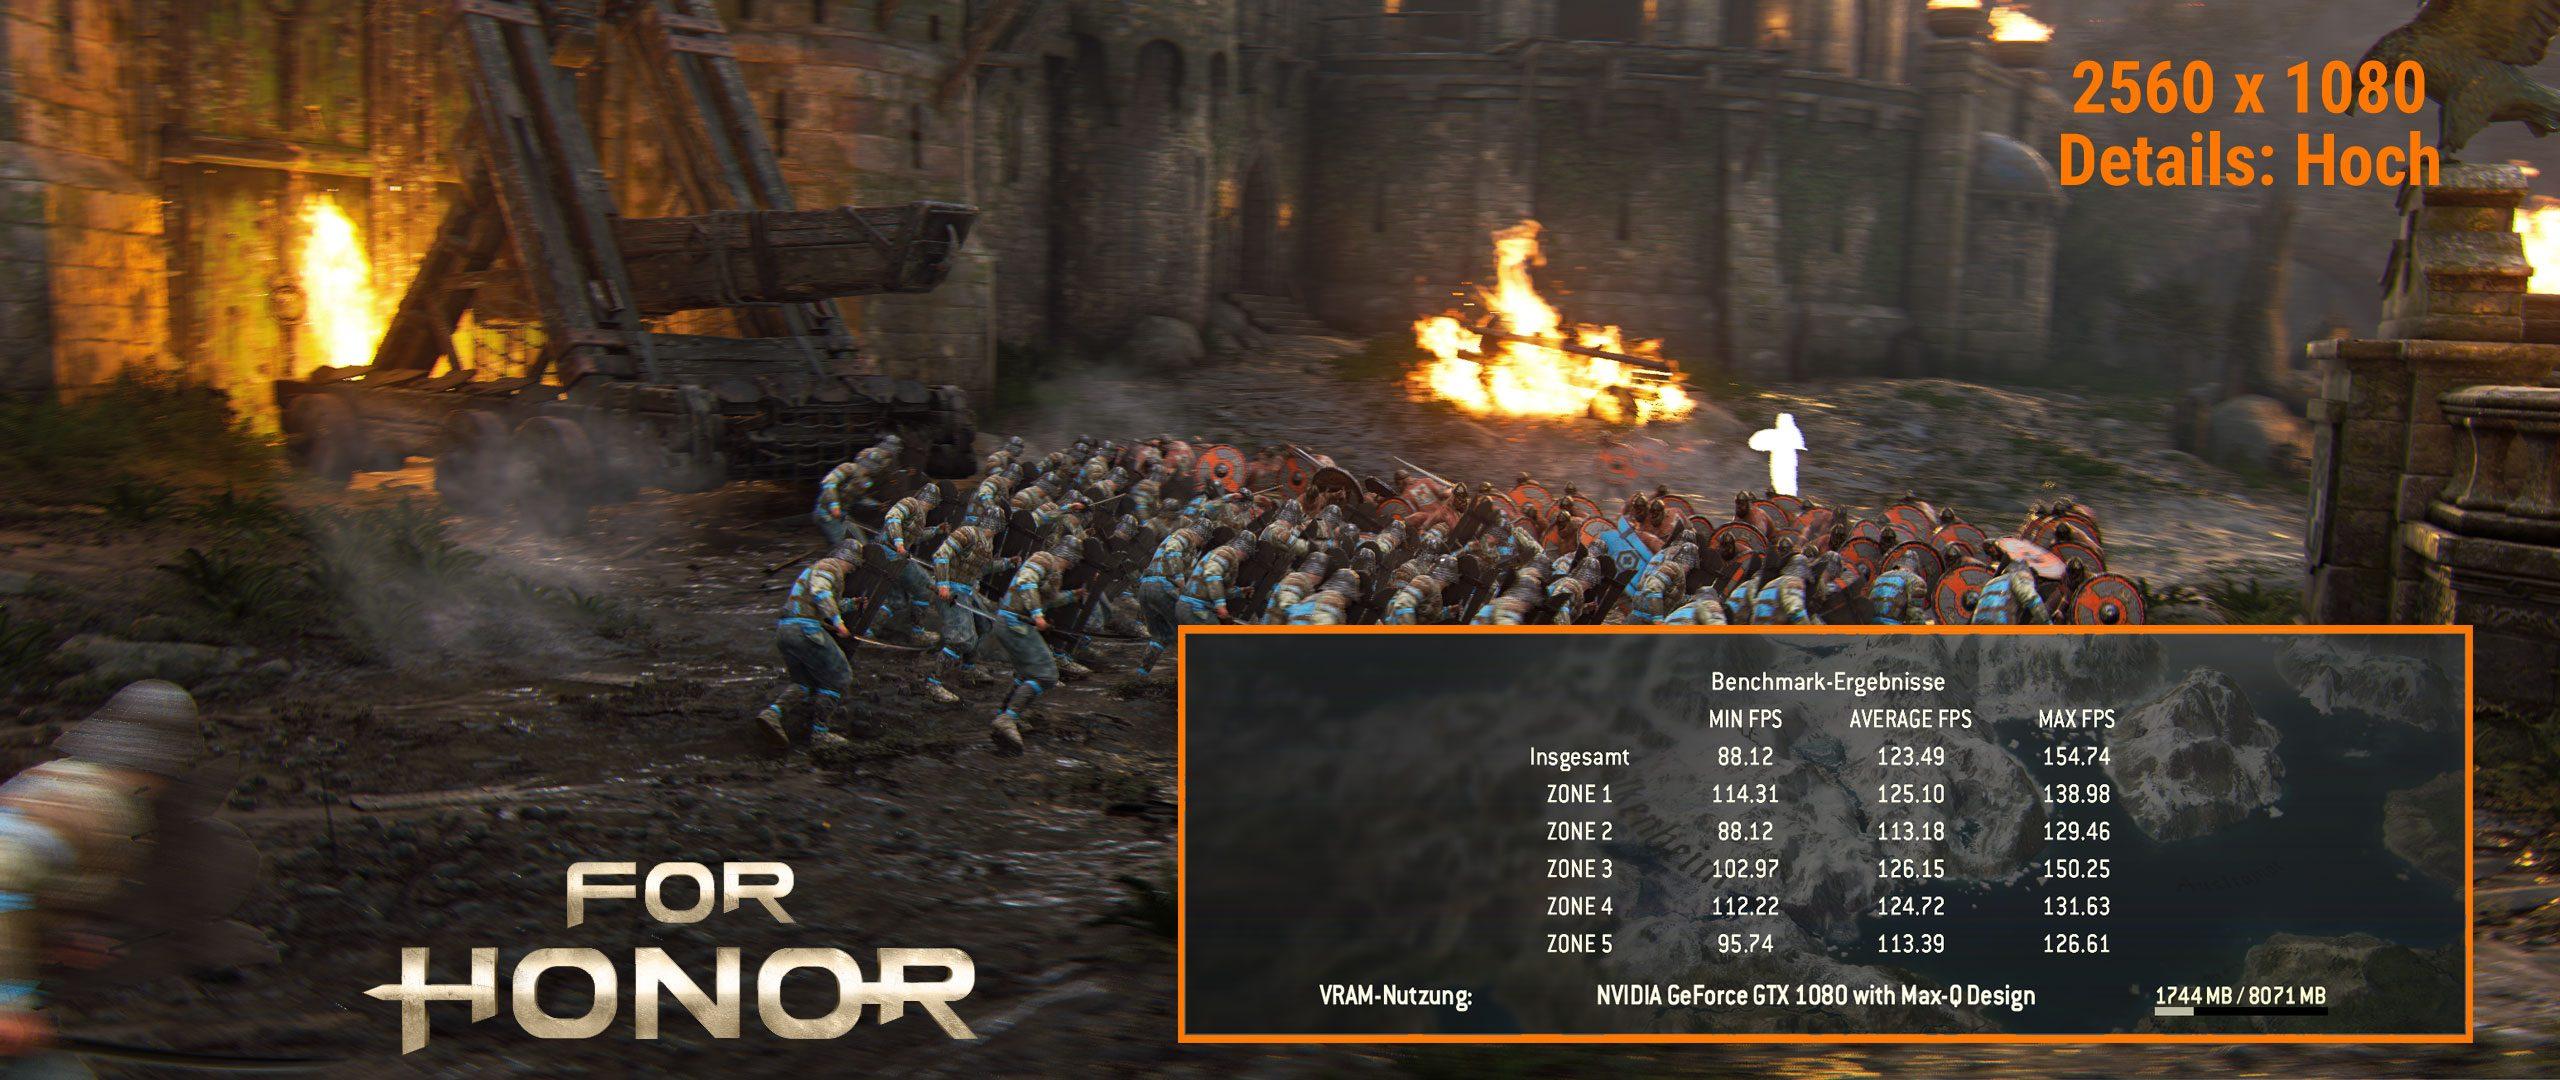 Asus-ROG-Zephyrus-GX501VI-GZ020T_Games-Monitor-6